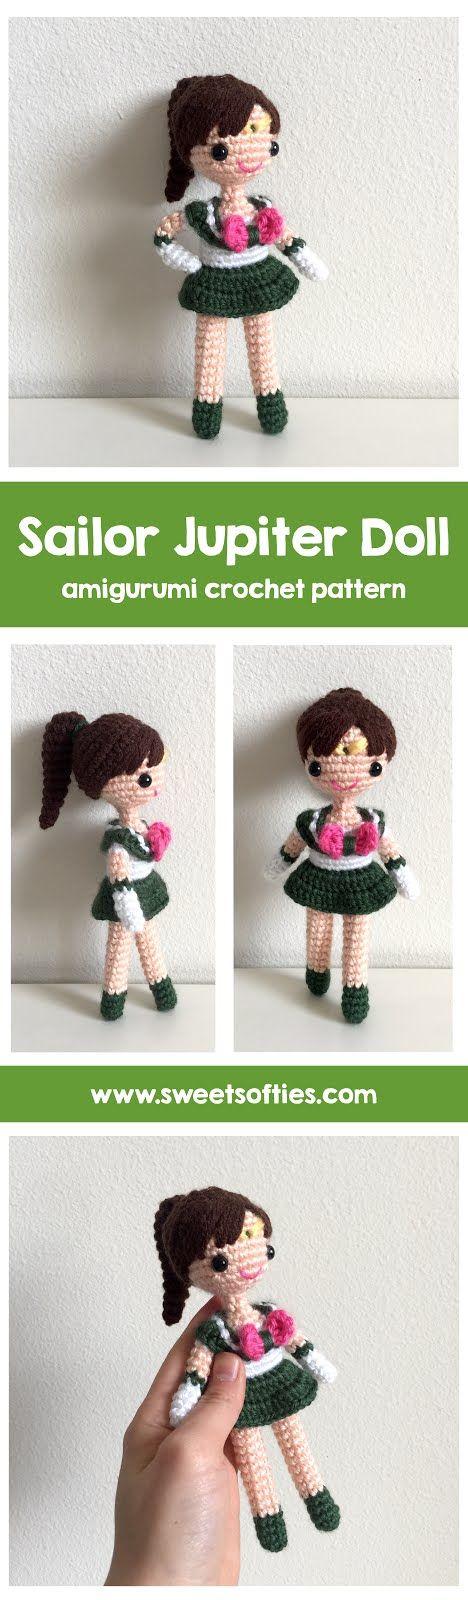 Dress-Up Bears   Amigurumi crochet pattern by Airali design   1600x468